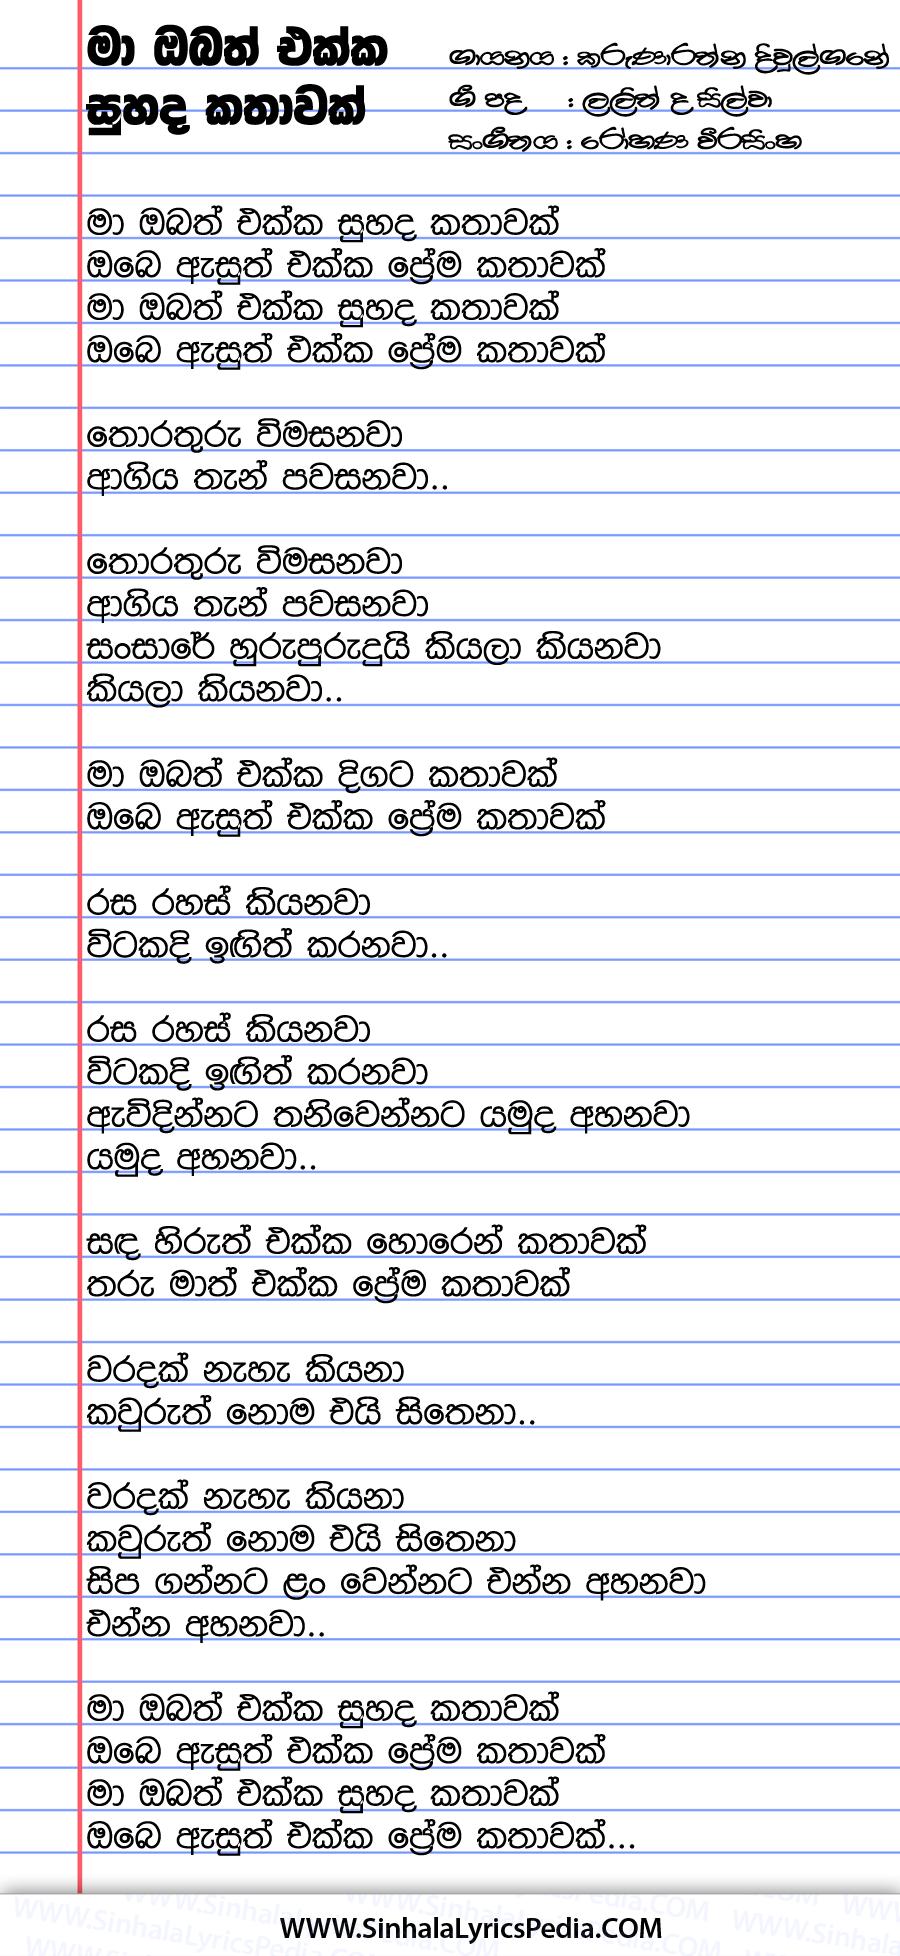 Ma Obath Ekka Suhada Kathawak Song Lyrics